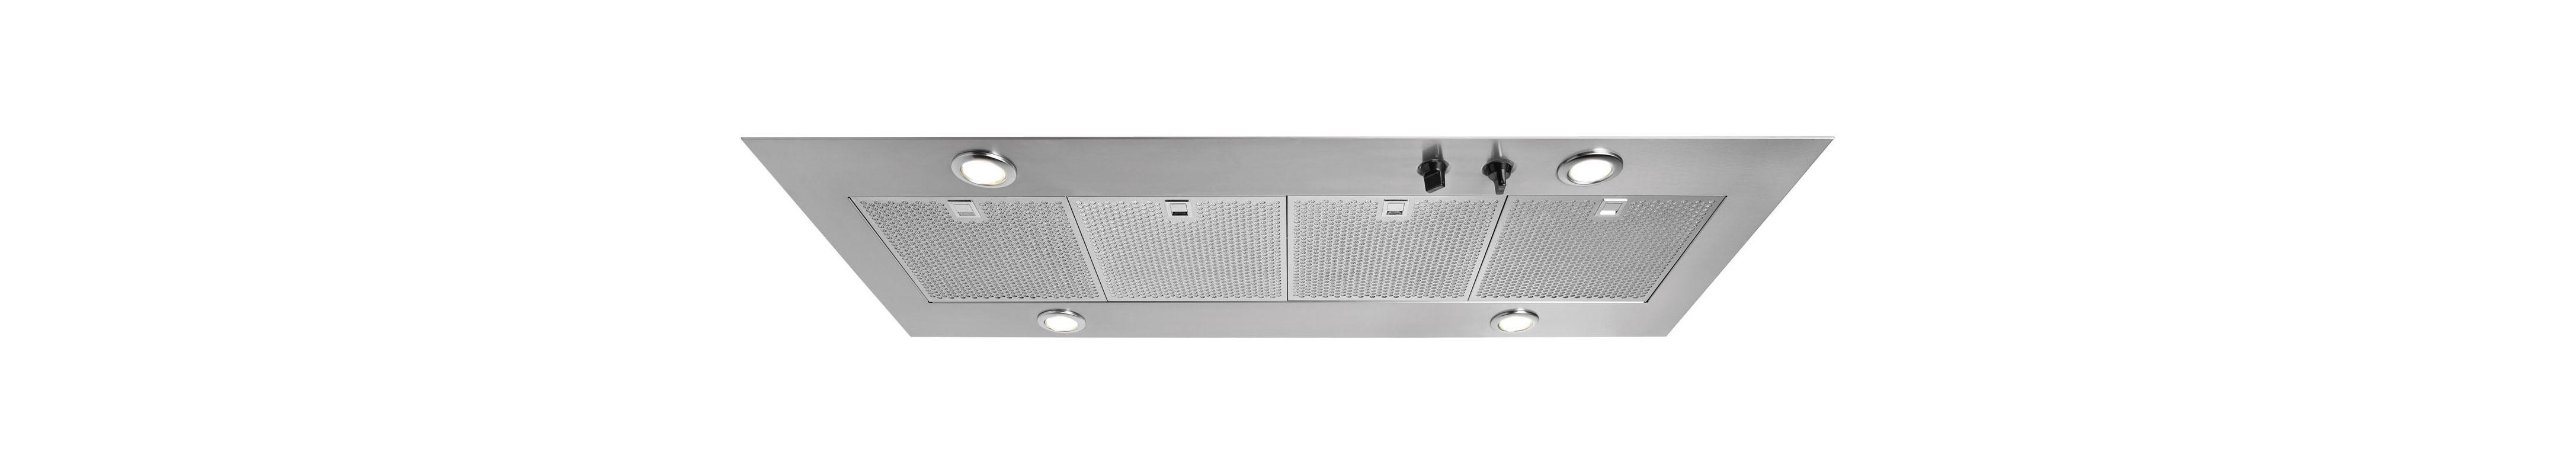 Electrolux EI48HI55K 48